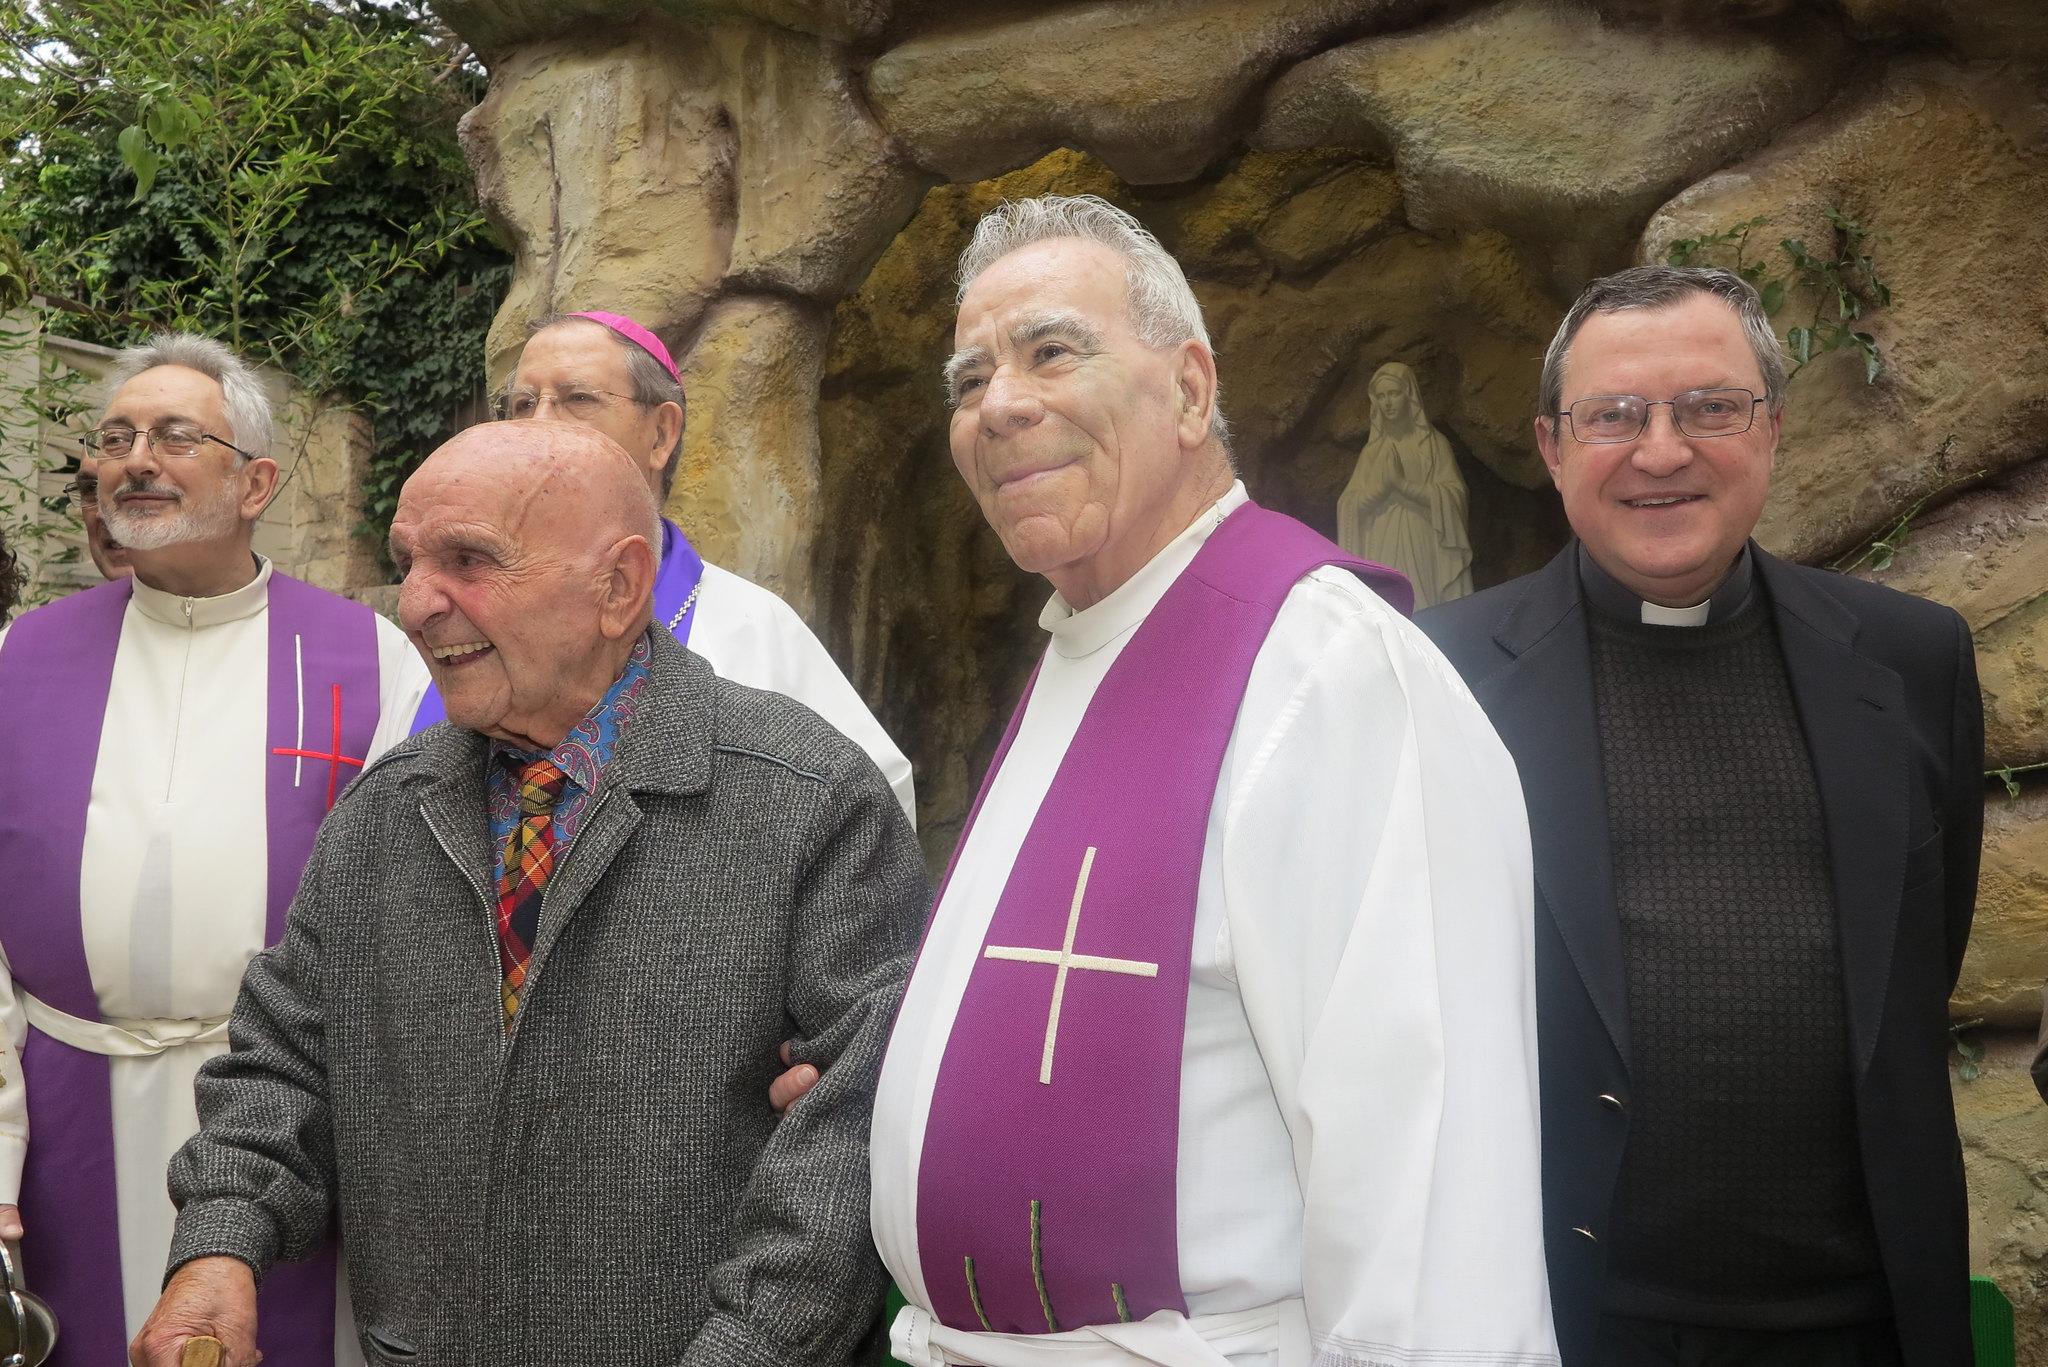 (2016-02-13) - Inauguración Virgen de Lourdes, La Molineta - Archivo La Molineta 2 (64)